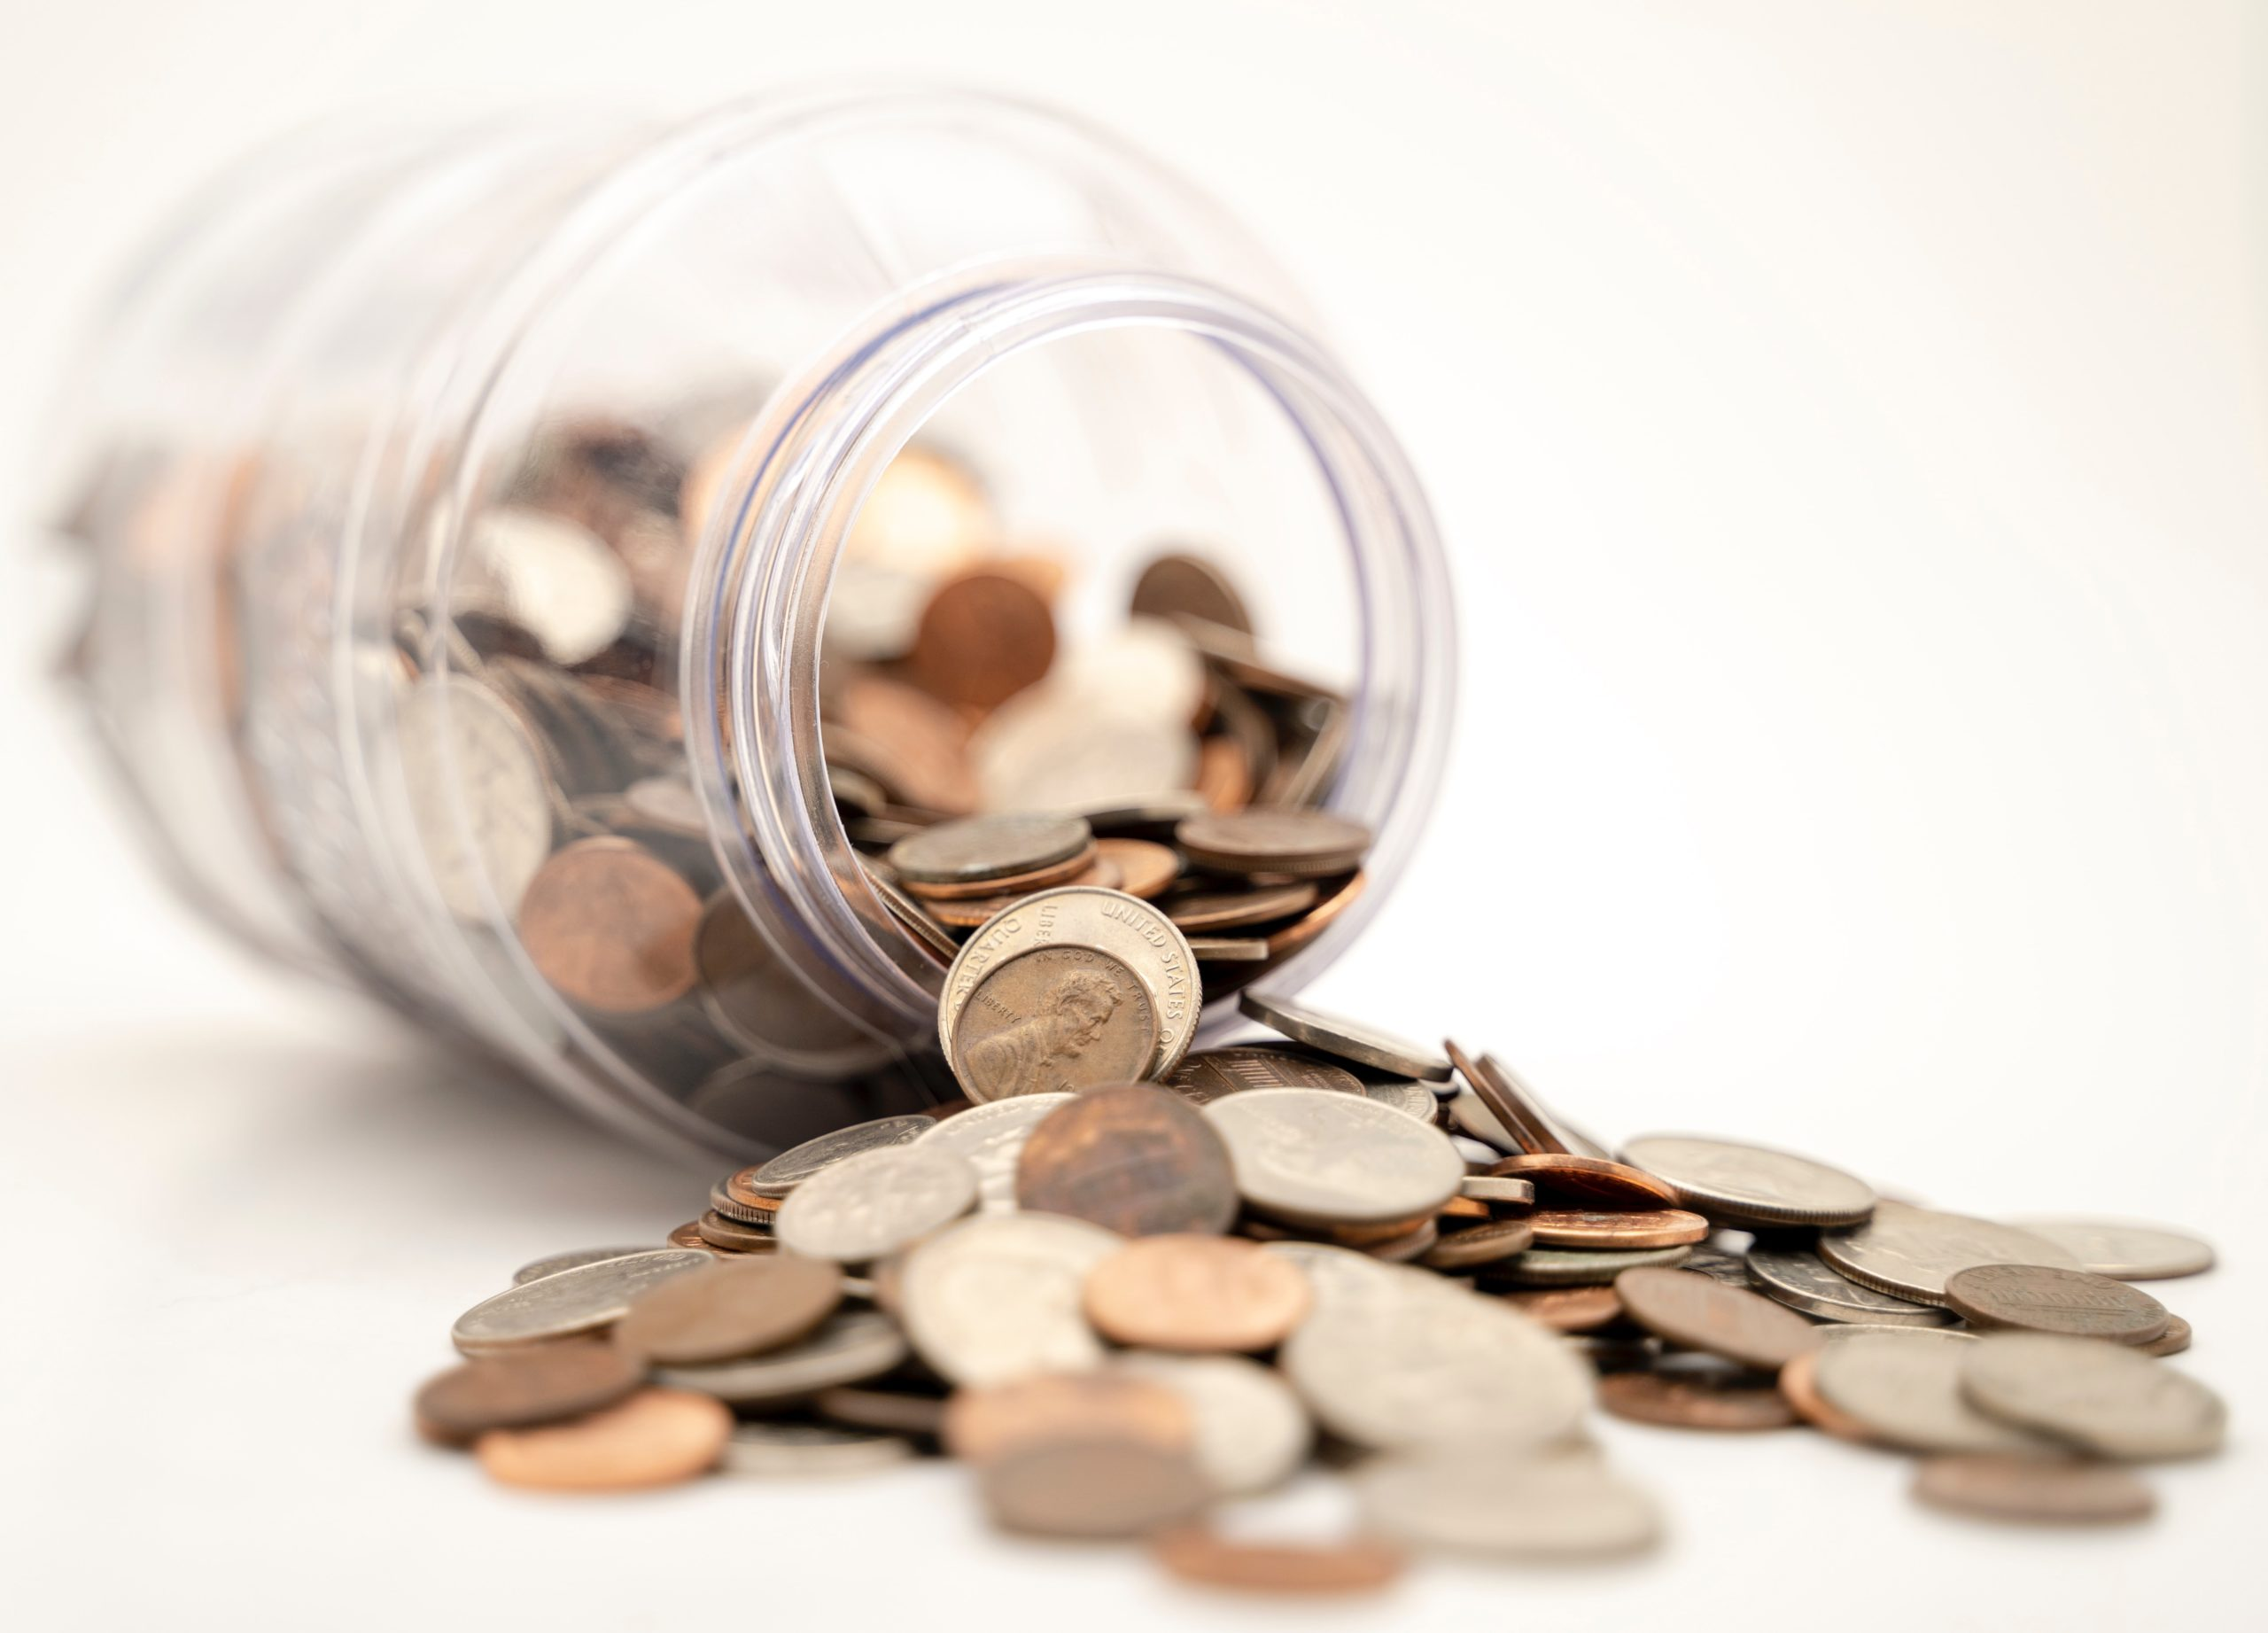 Savings plan Photo by Michael Longmire on Unsplash